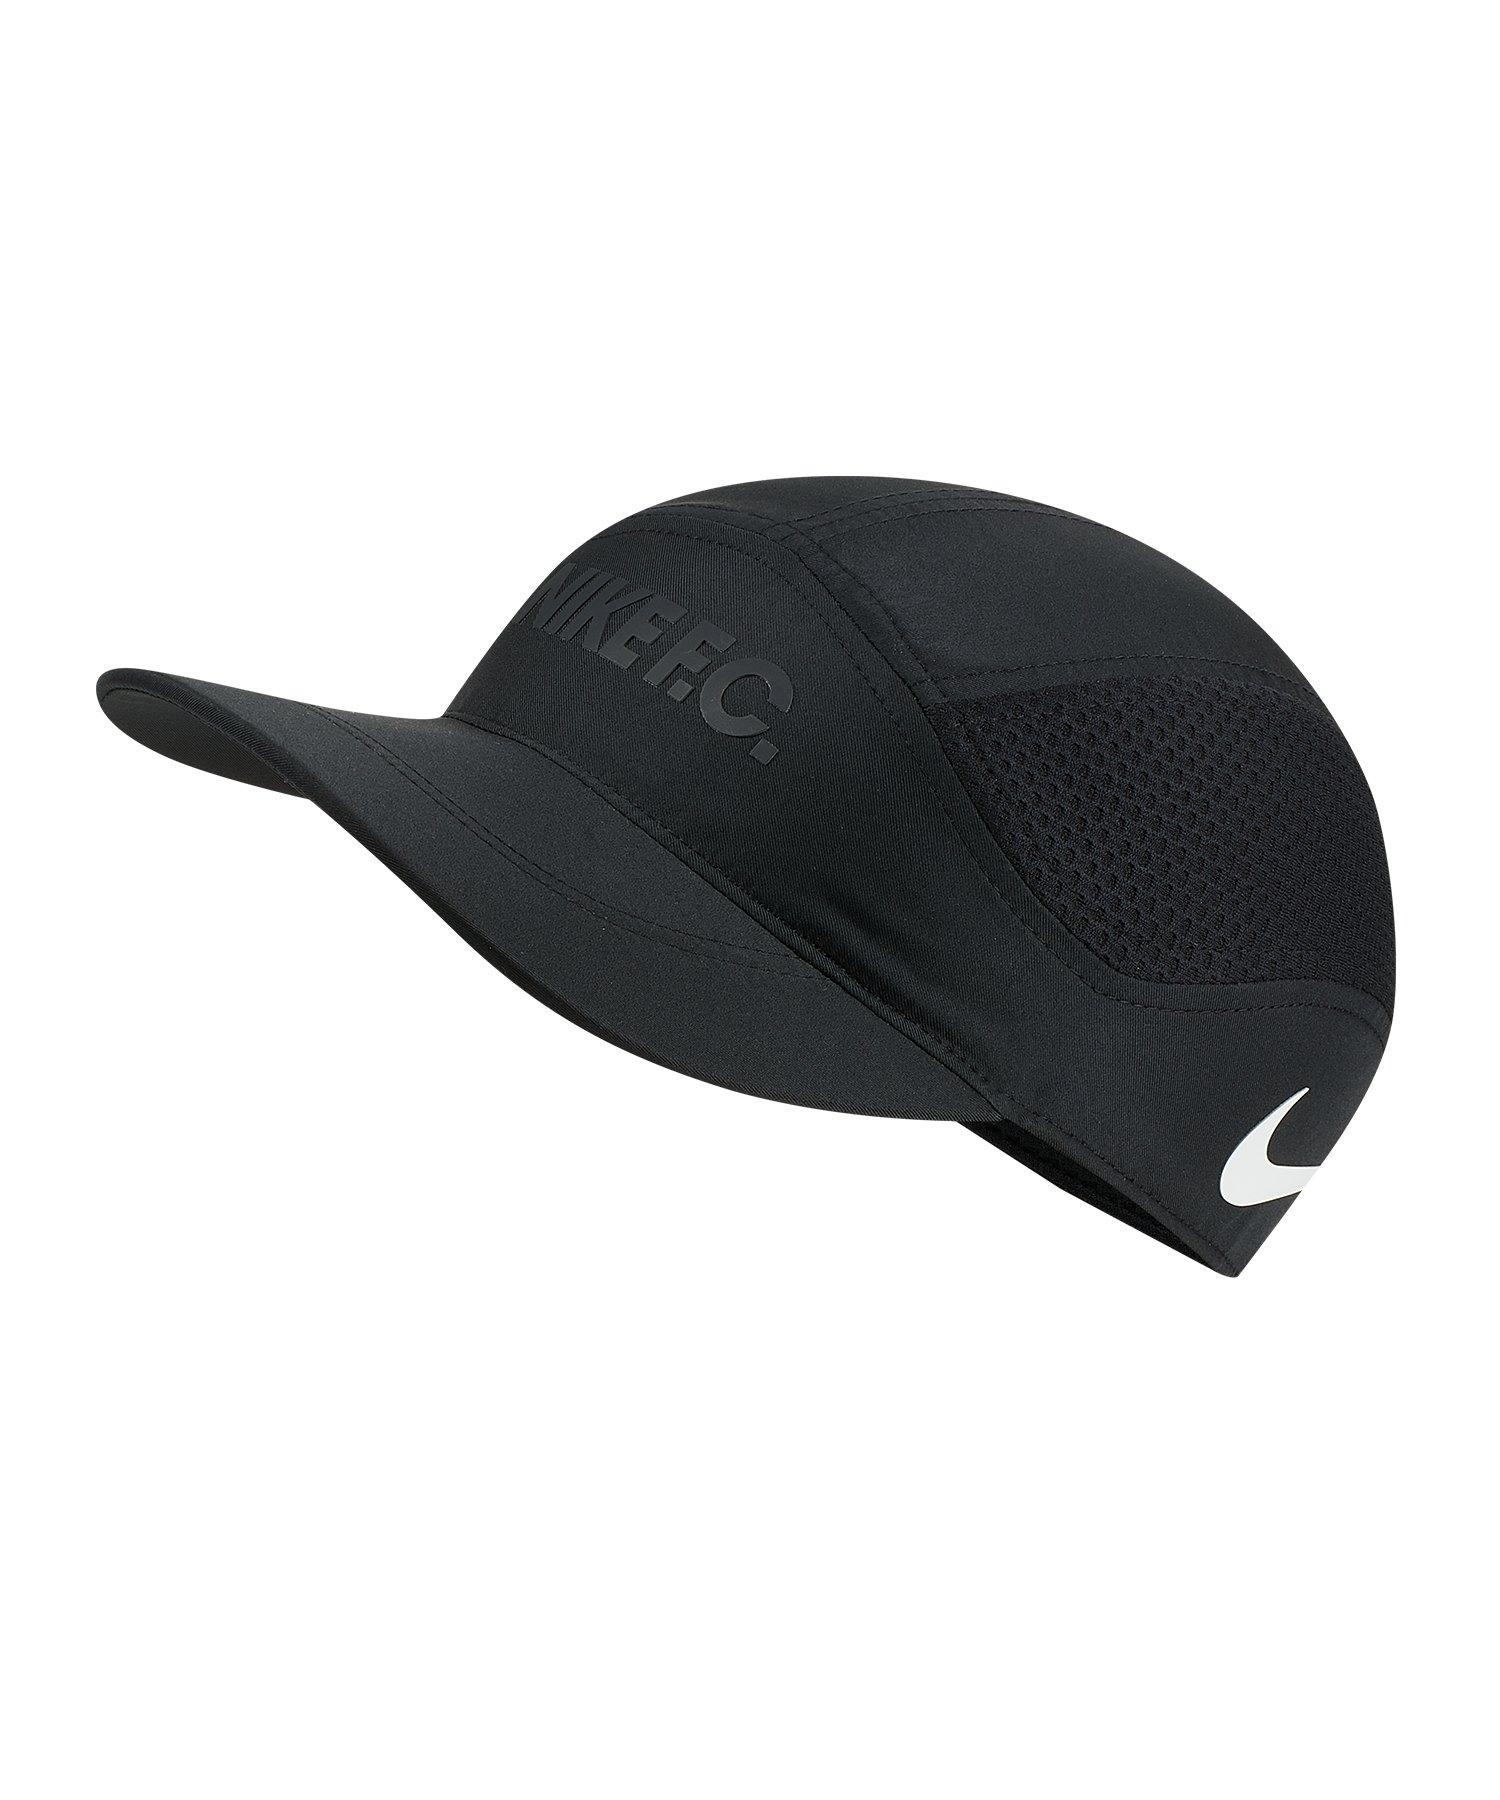 Nike F.C. Aero TLWD Cap Kappe Schwarz F010 - Schwarz